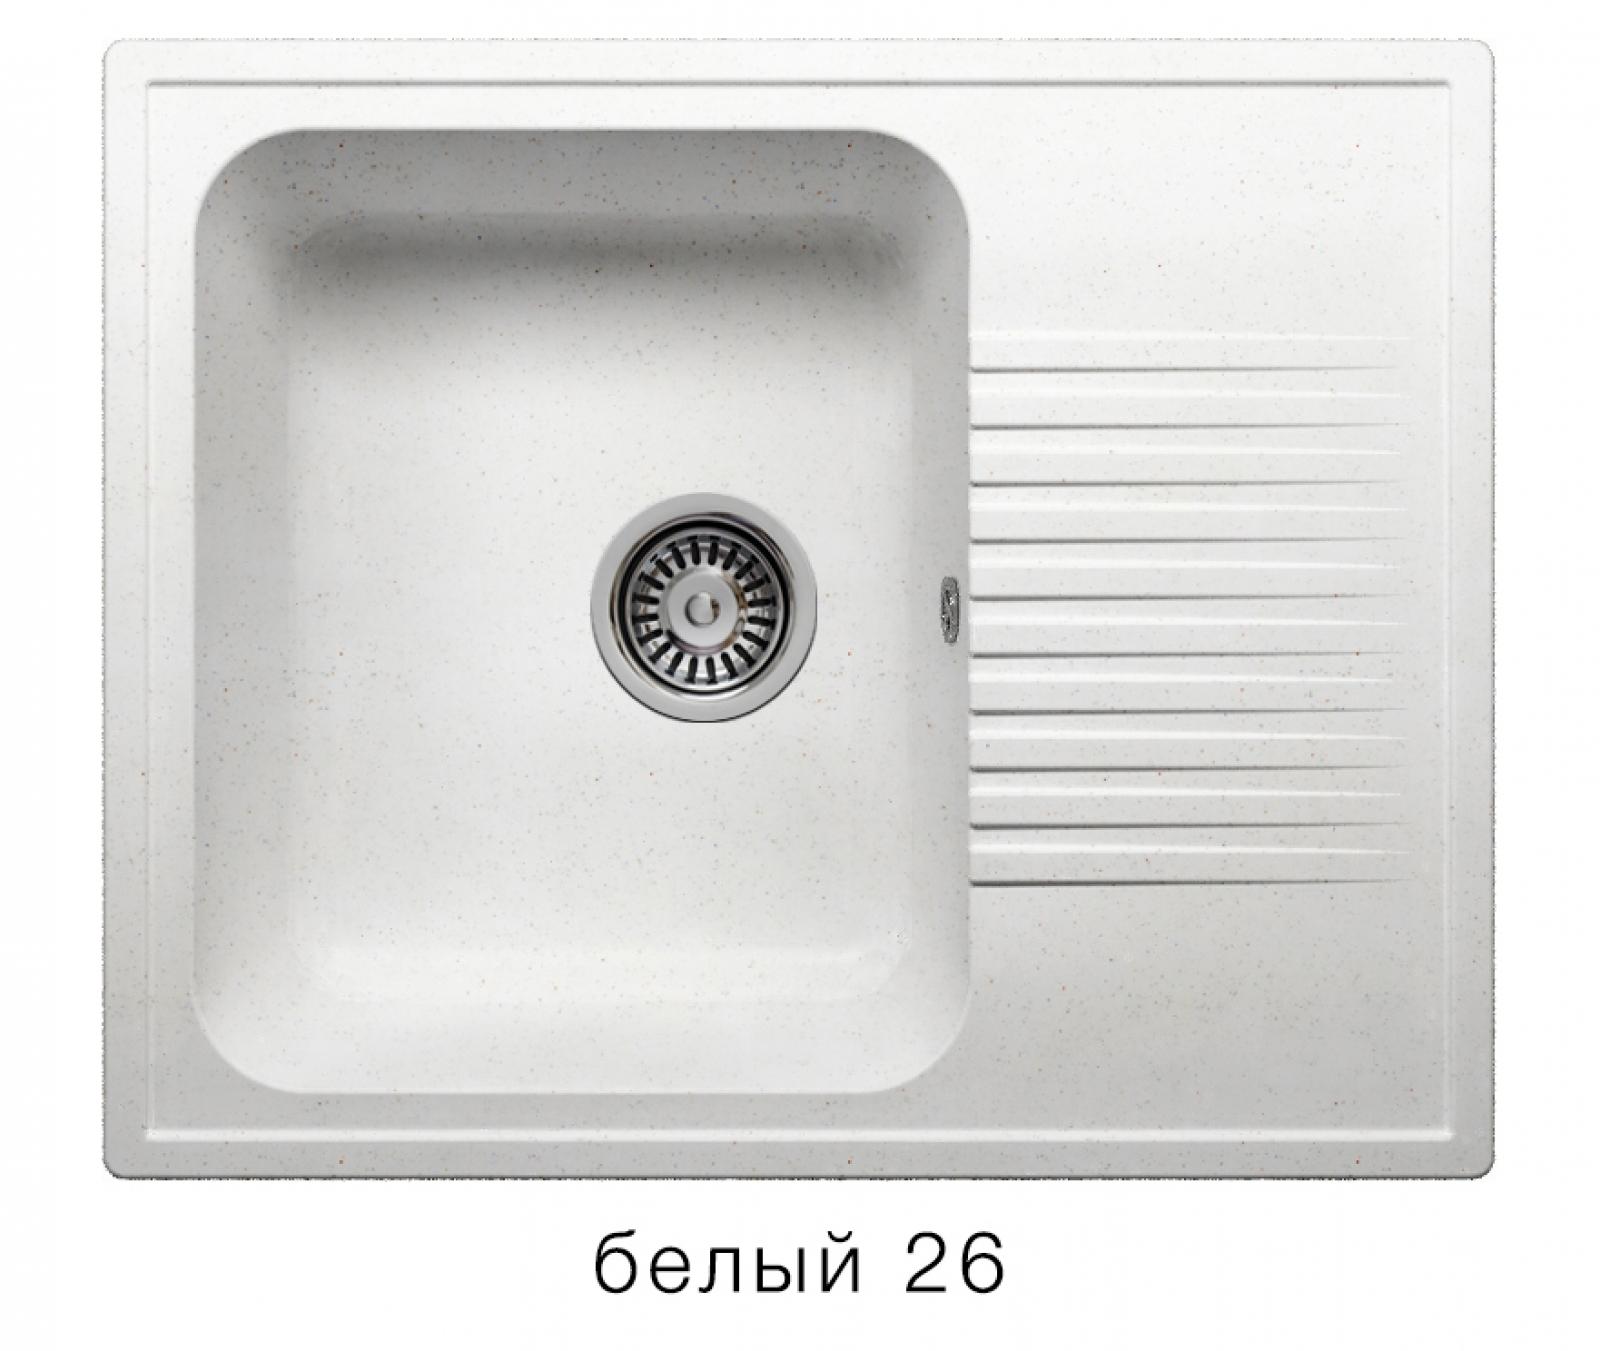 Мойка Polygran-F-07-026, цвет - Белый